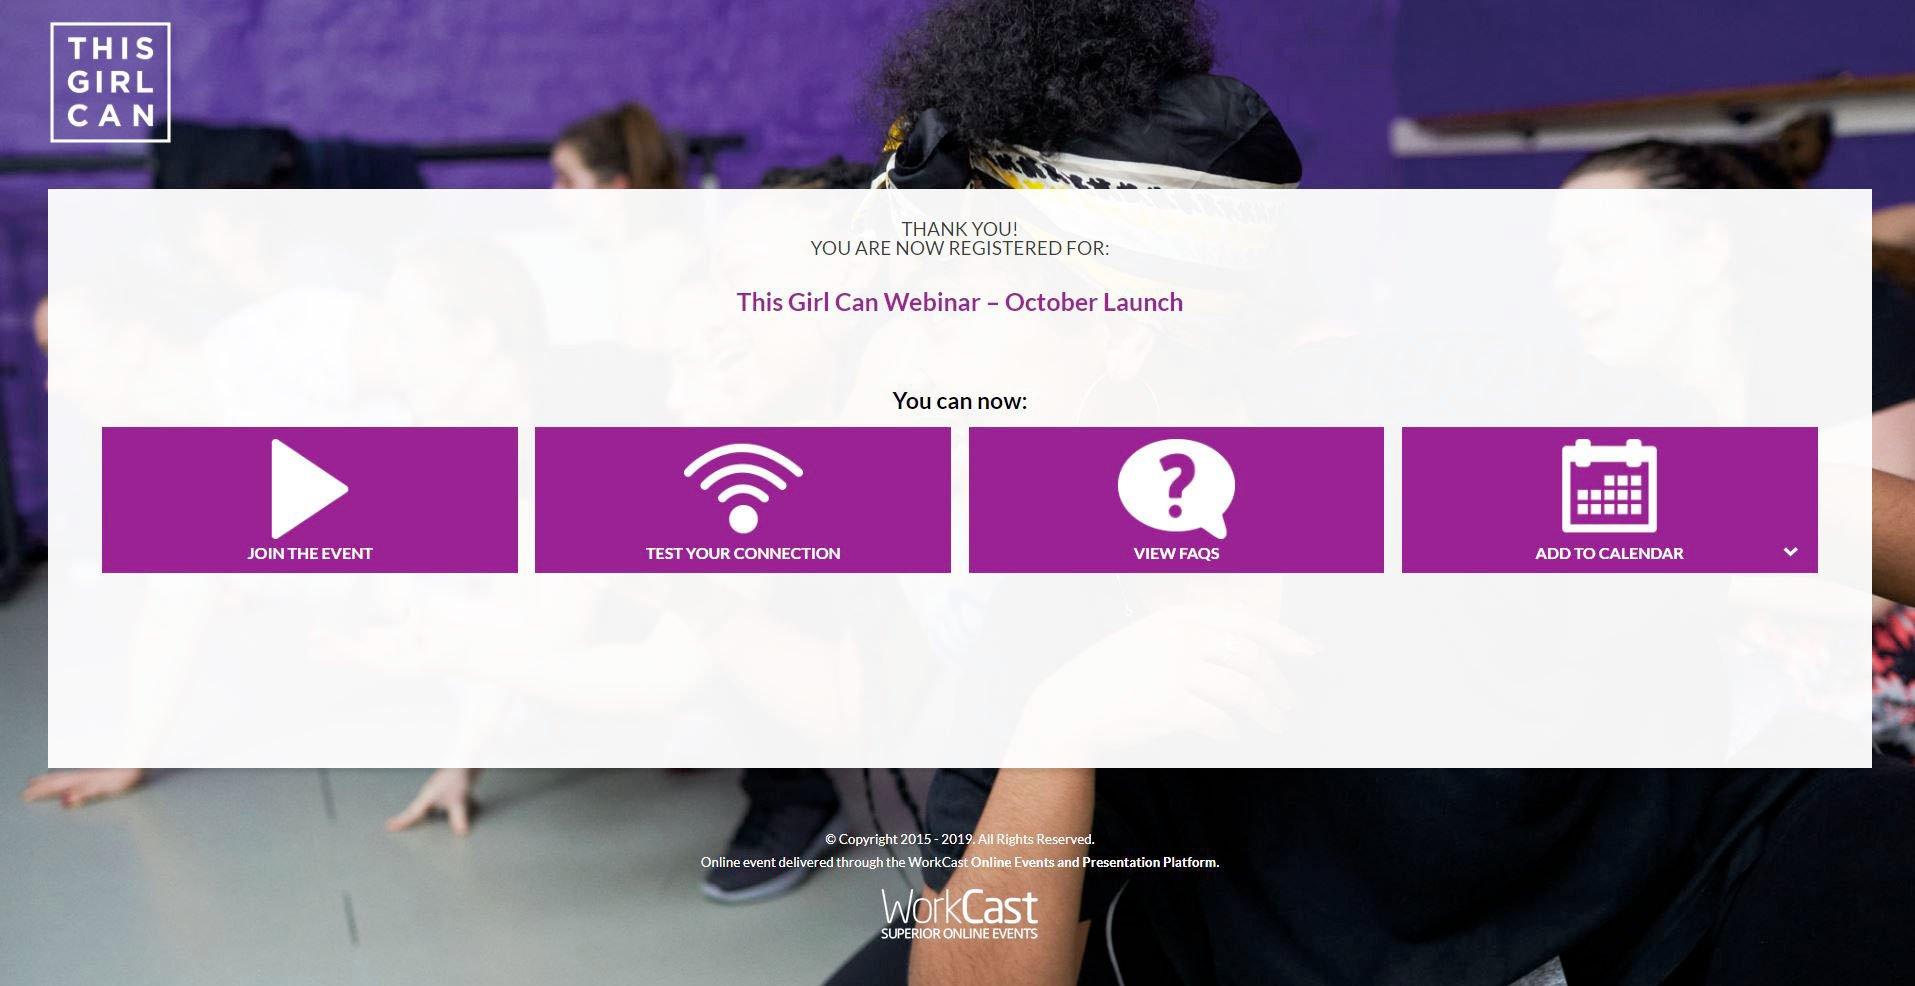 Webinar registration confirmation landing page